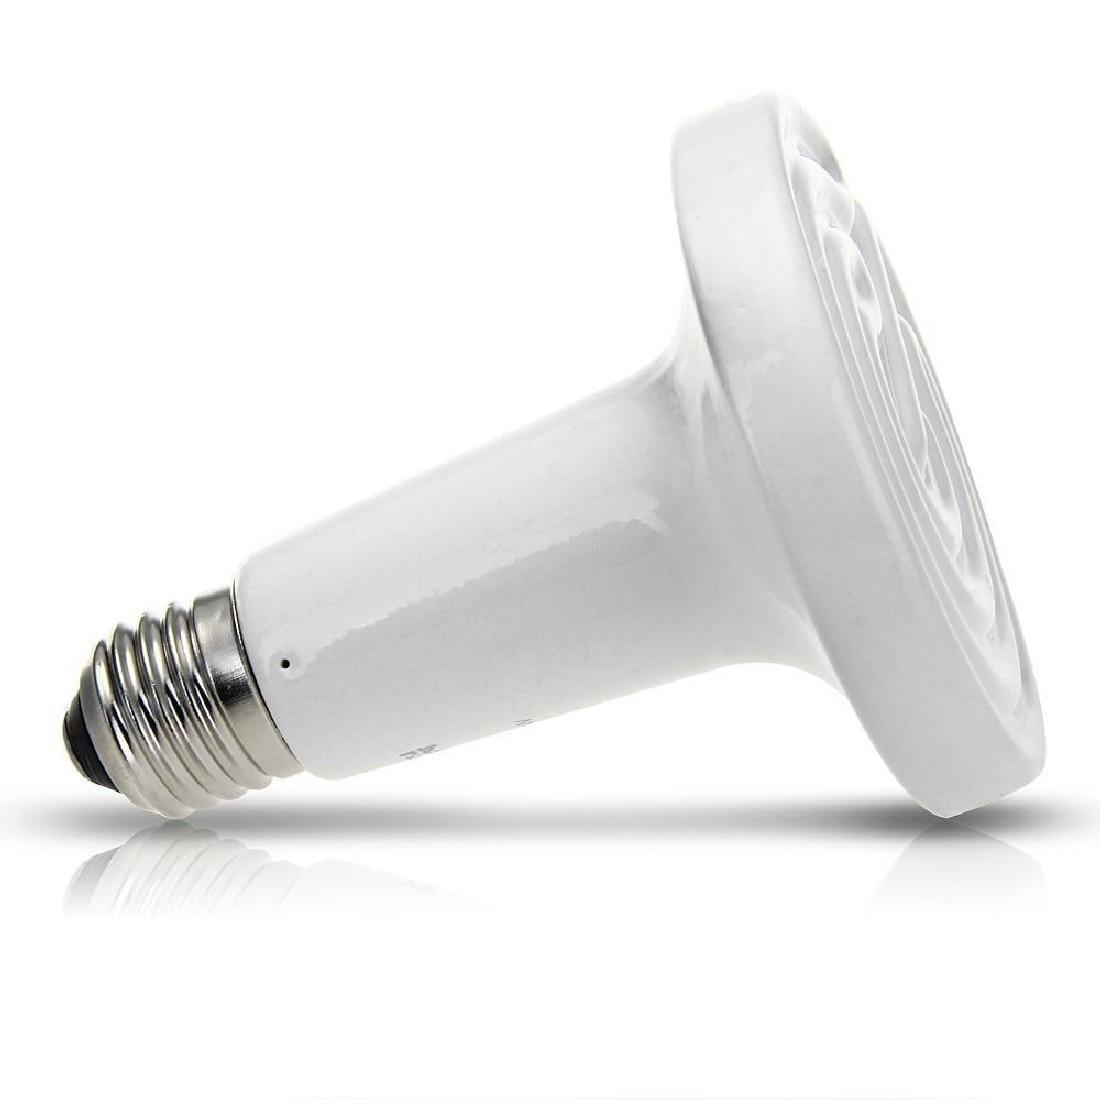 75W 220V Ceramic Heat Emitter Brooder Infared Lamp Bulb Reptile Grow LED Bulbs High-quality